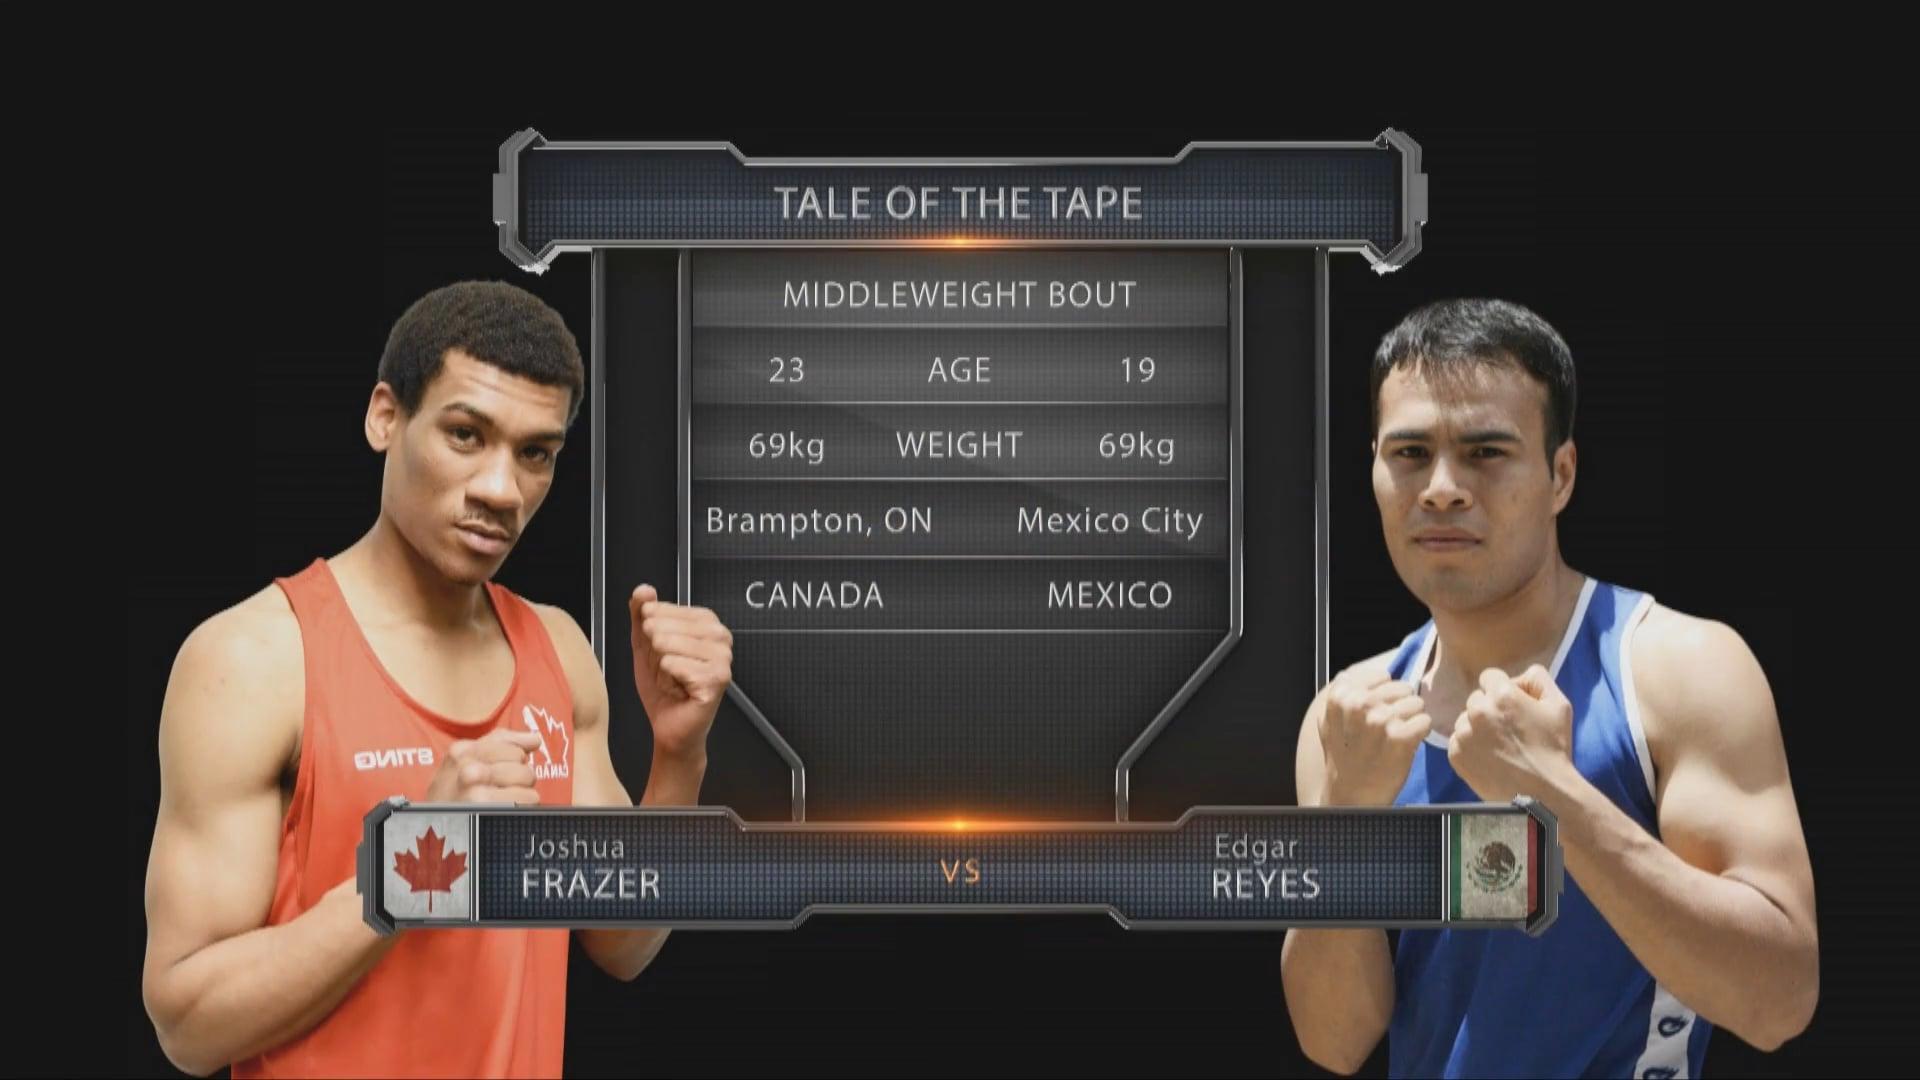 Joshua Frazer (CAN) vs Edgar Reyes (MEX)